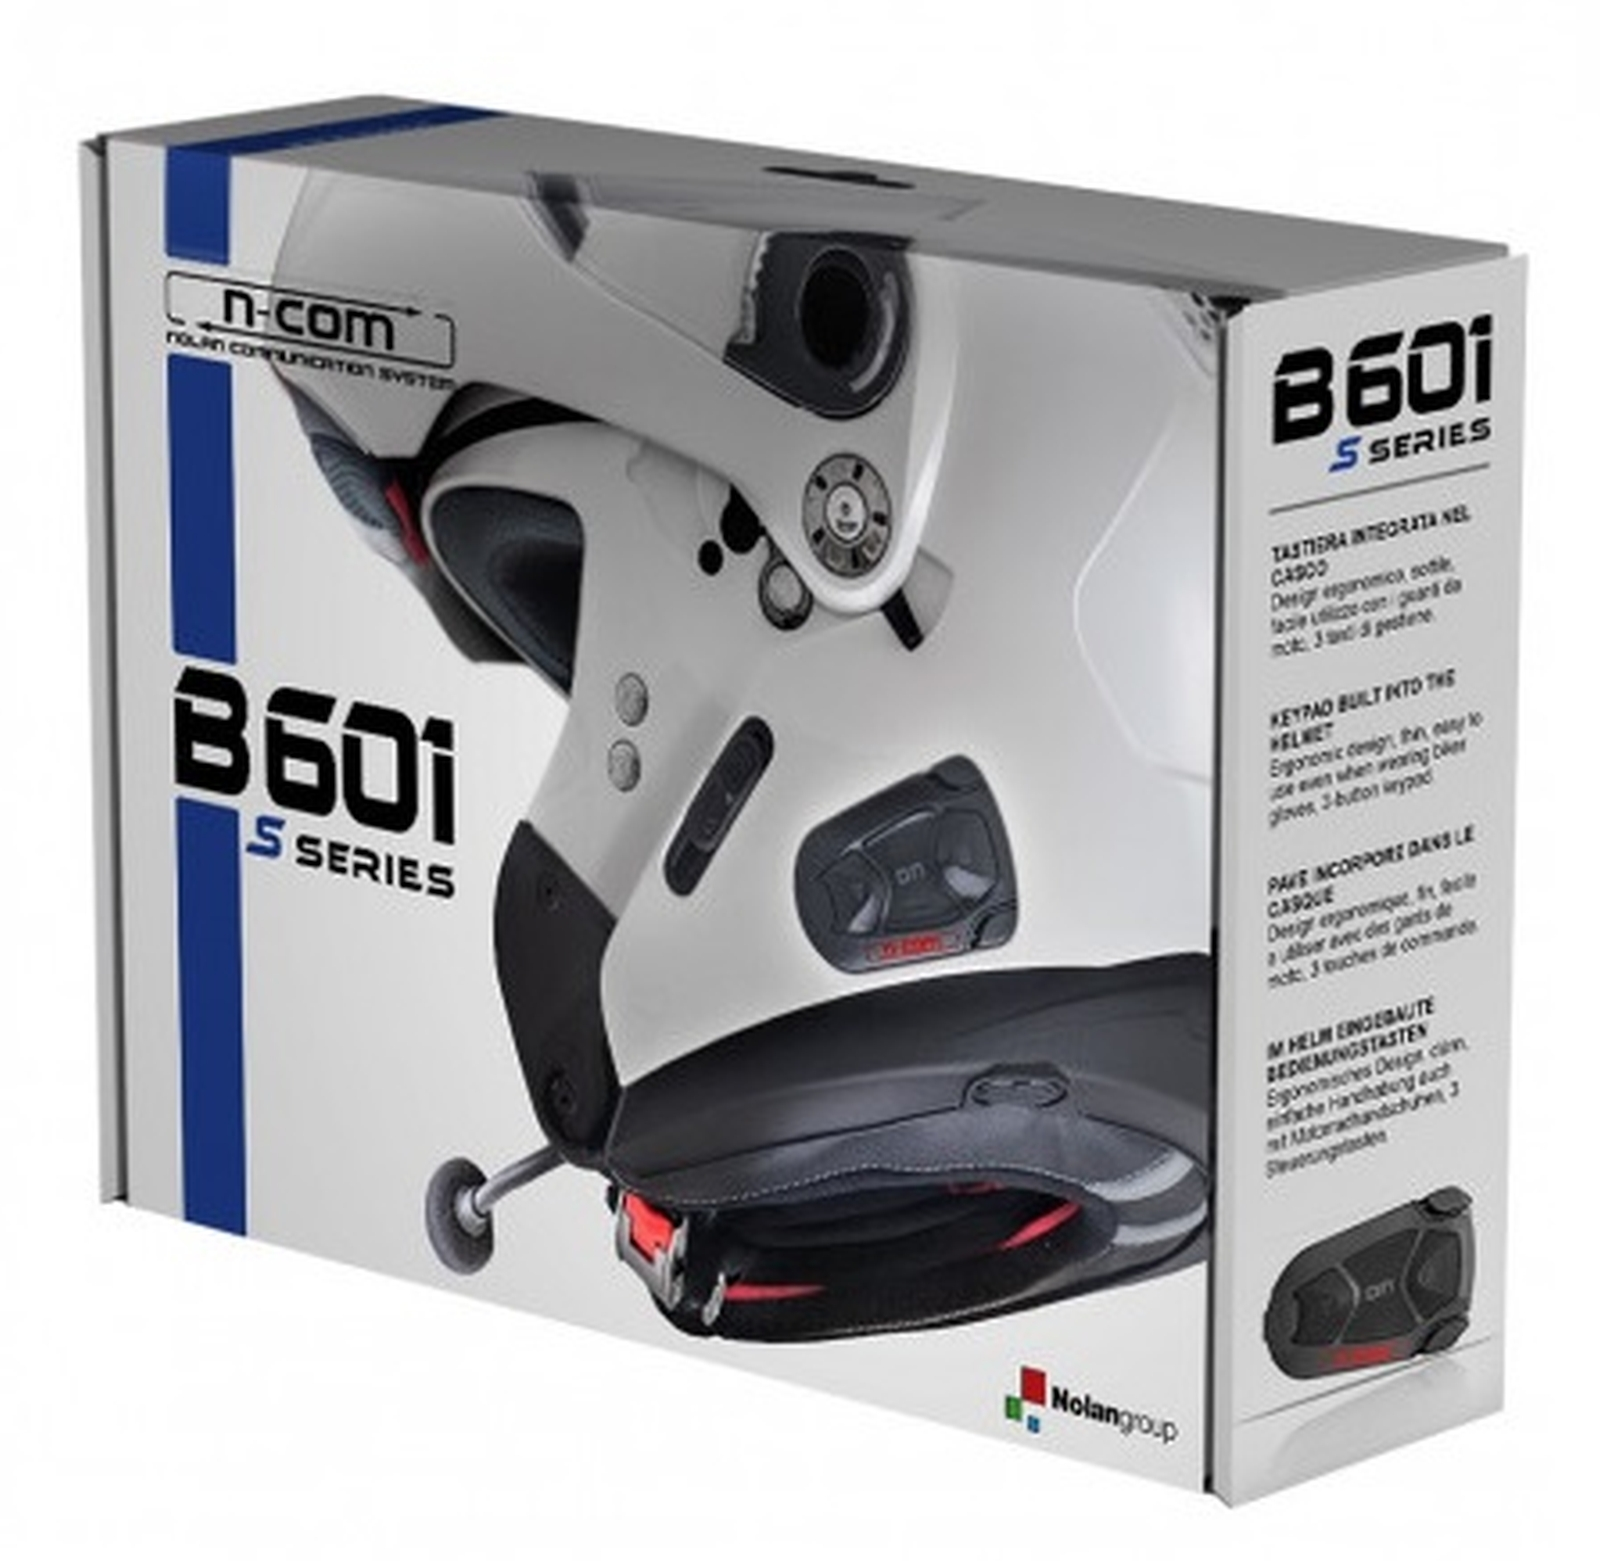 INTERFONO B601 S SERIES